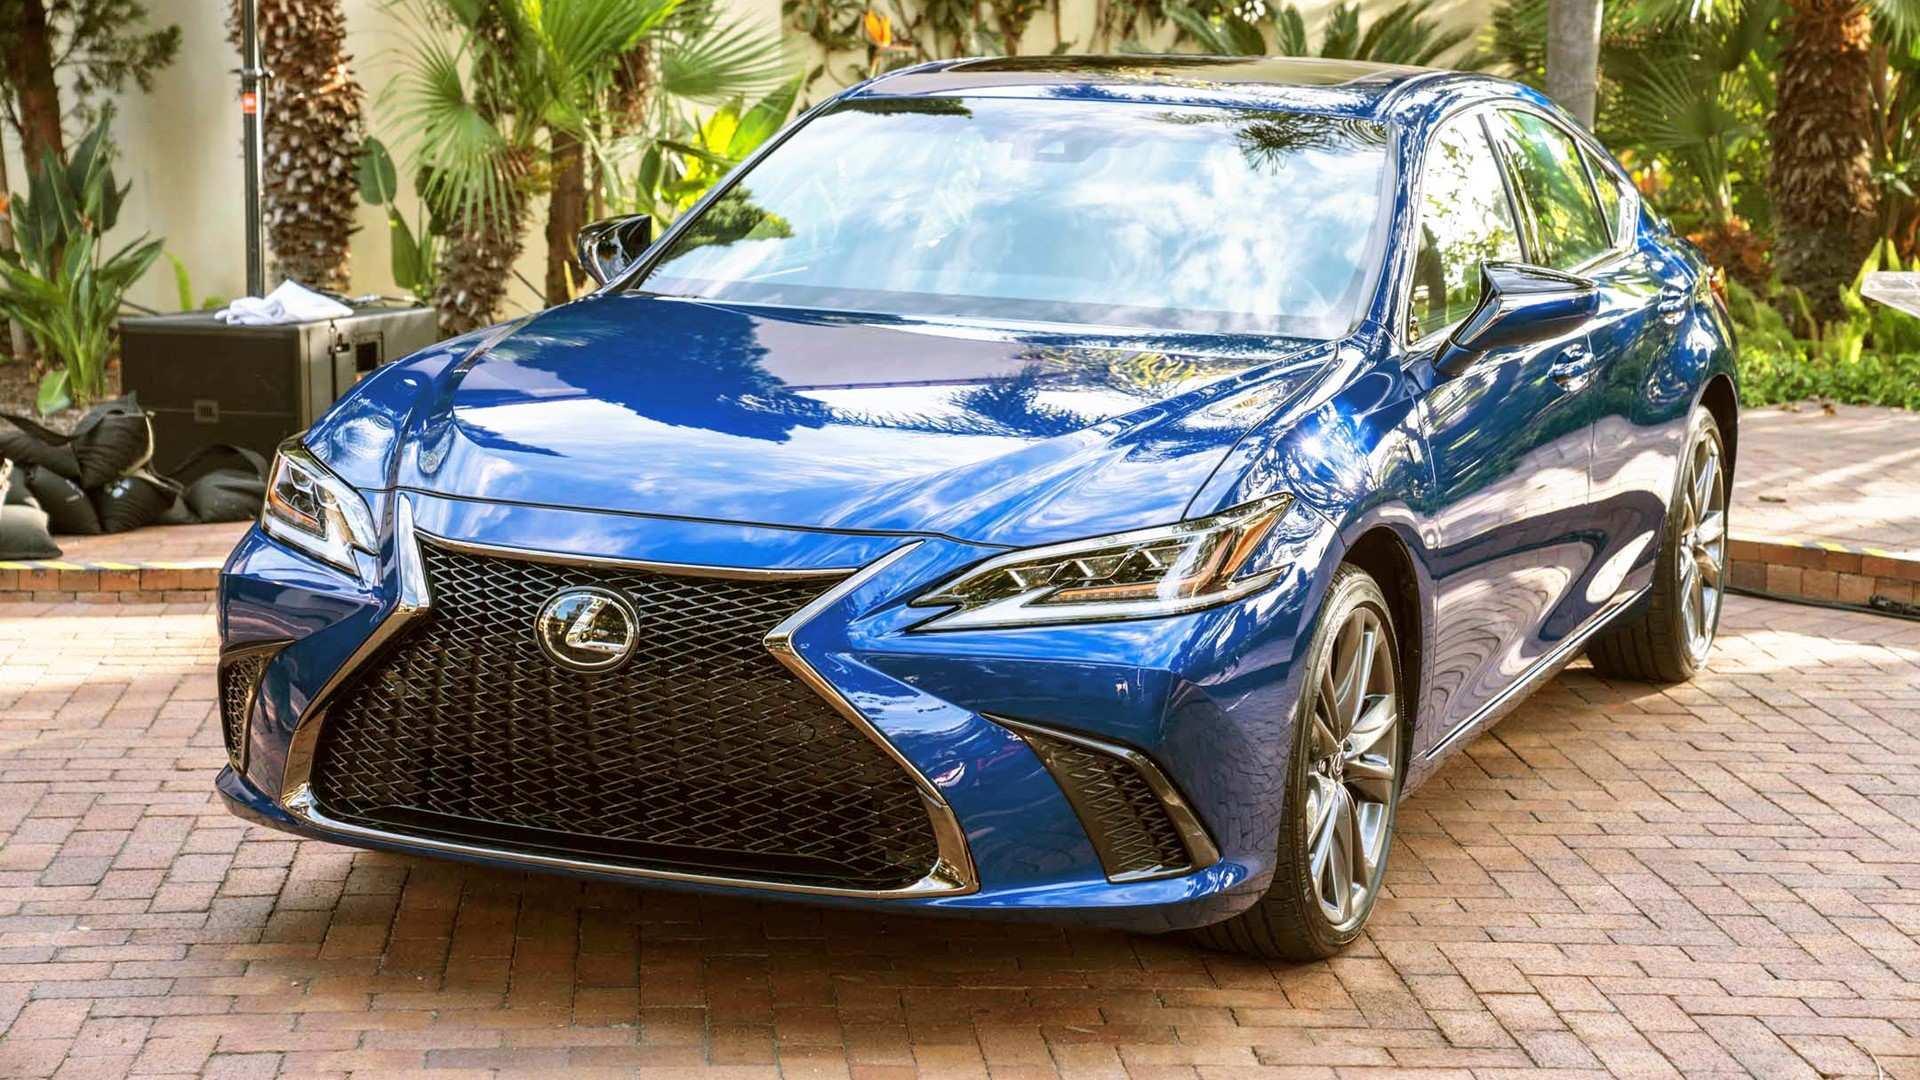 39 Gallery of 2019 Lexus Availability 2 Performance for 2019 Lexus Availability 2